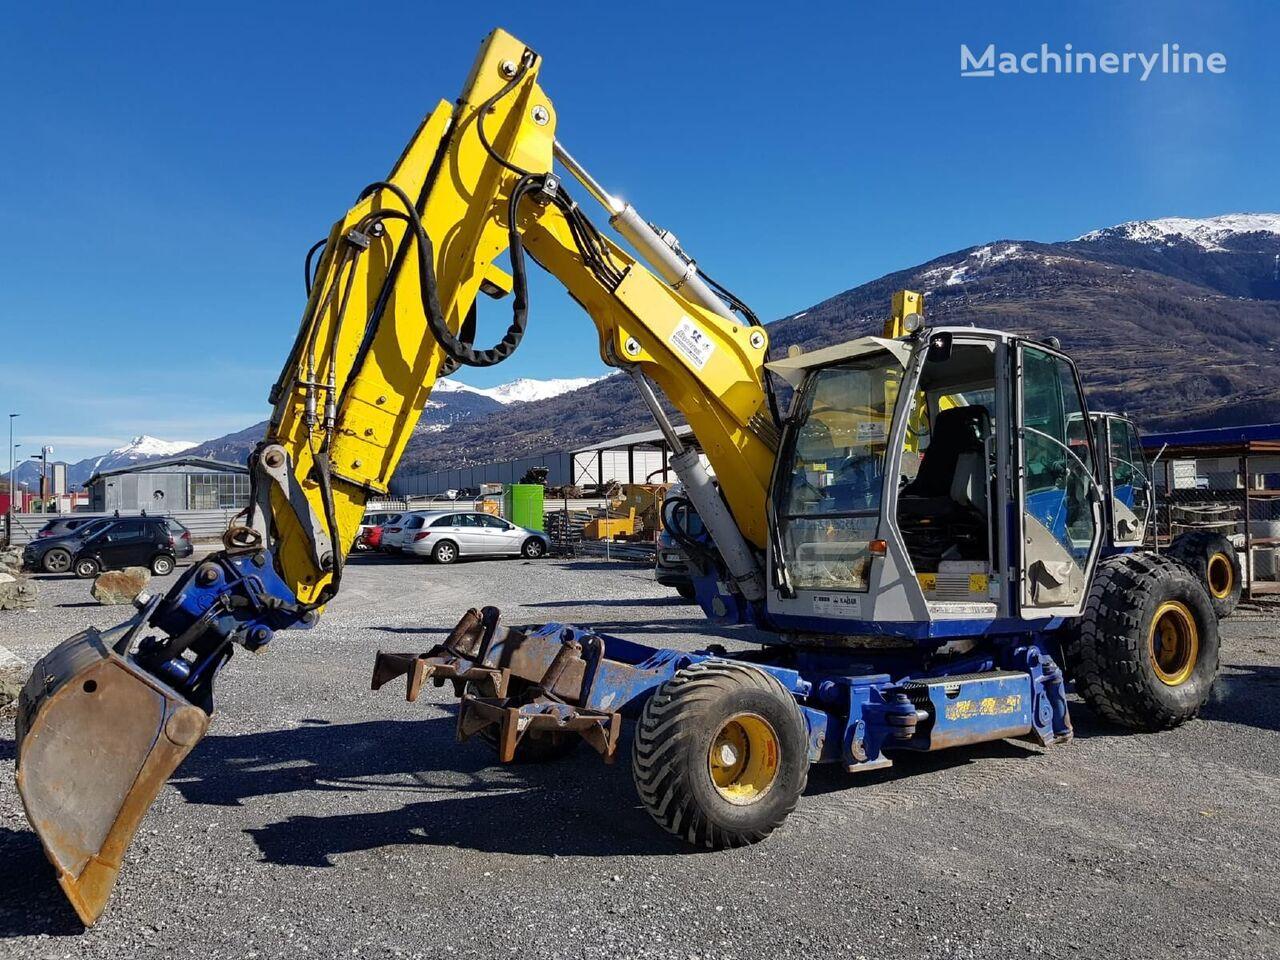 KAISER S2-4 walking excavator